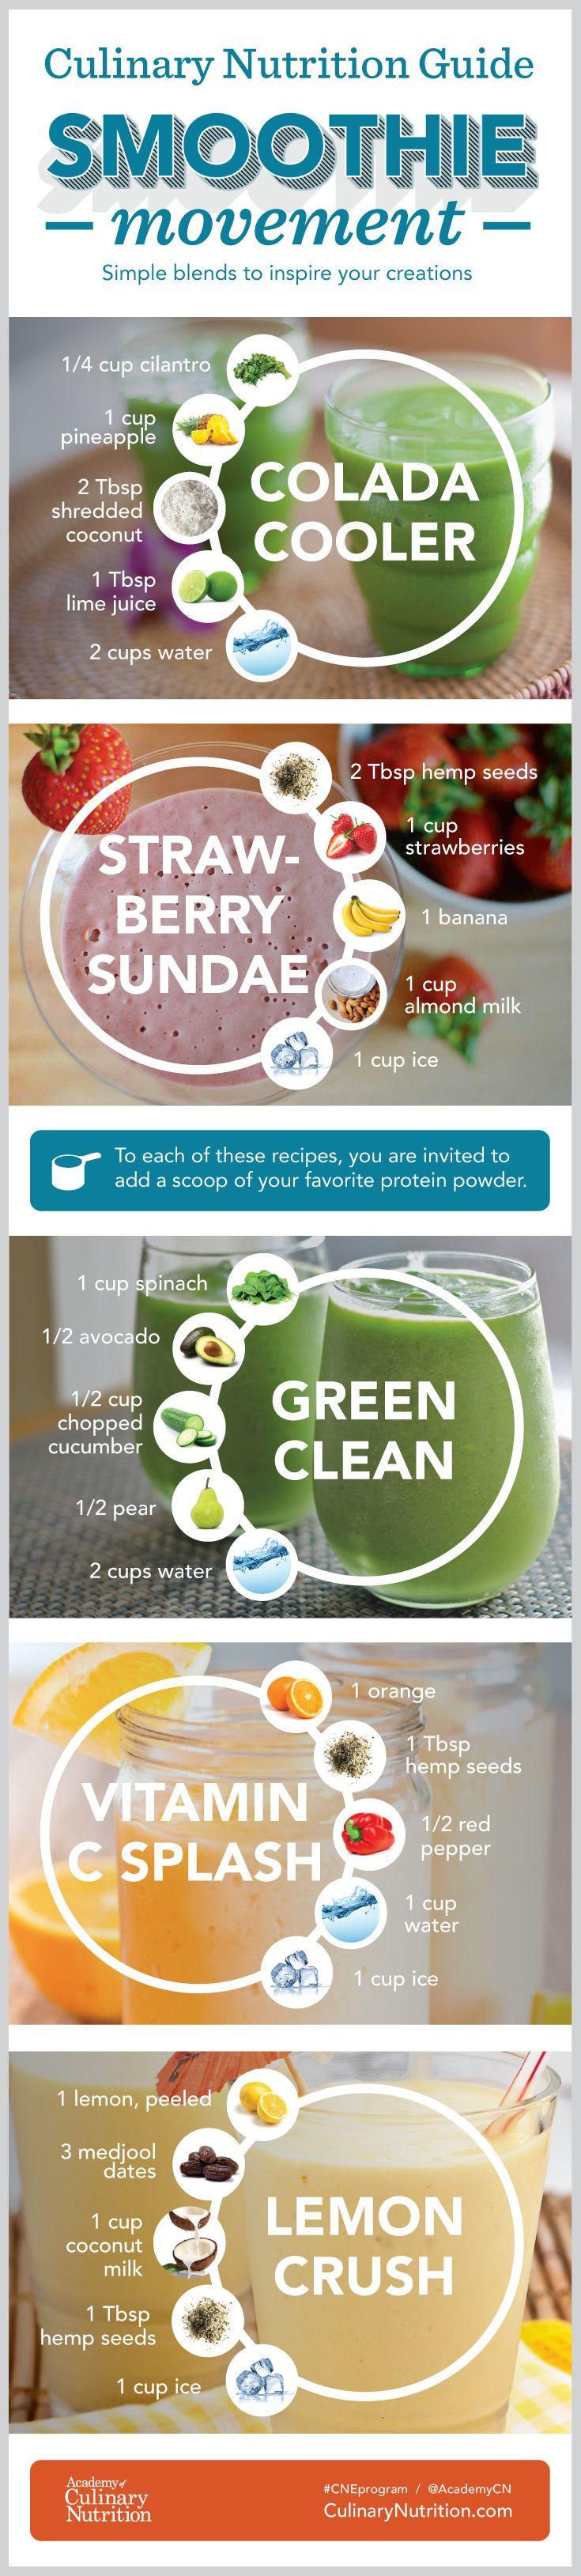 Simple Smoothie Recipe Infographic